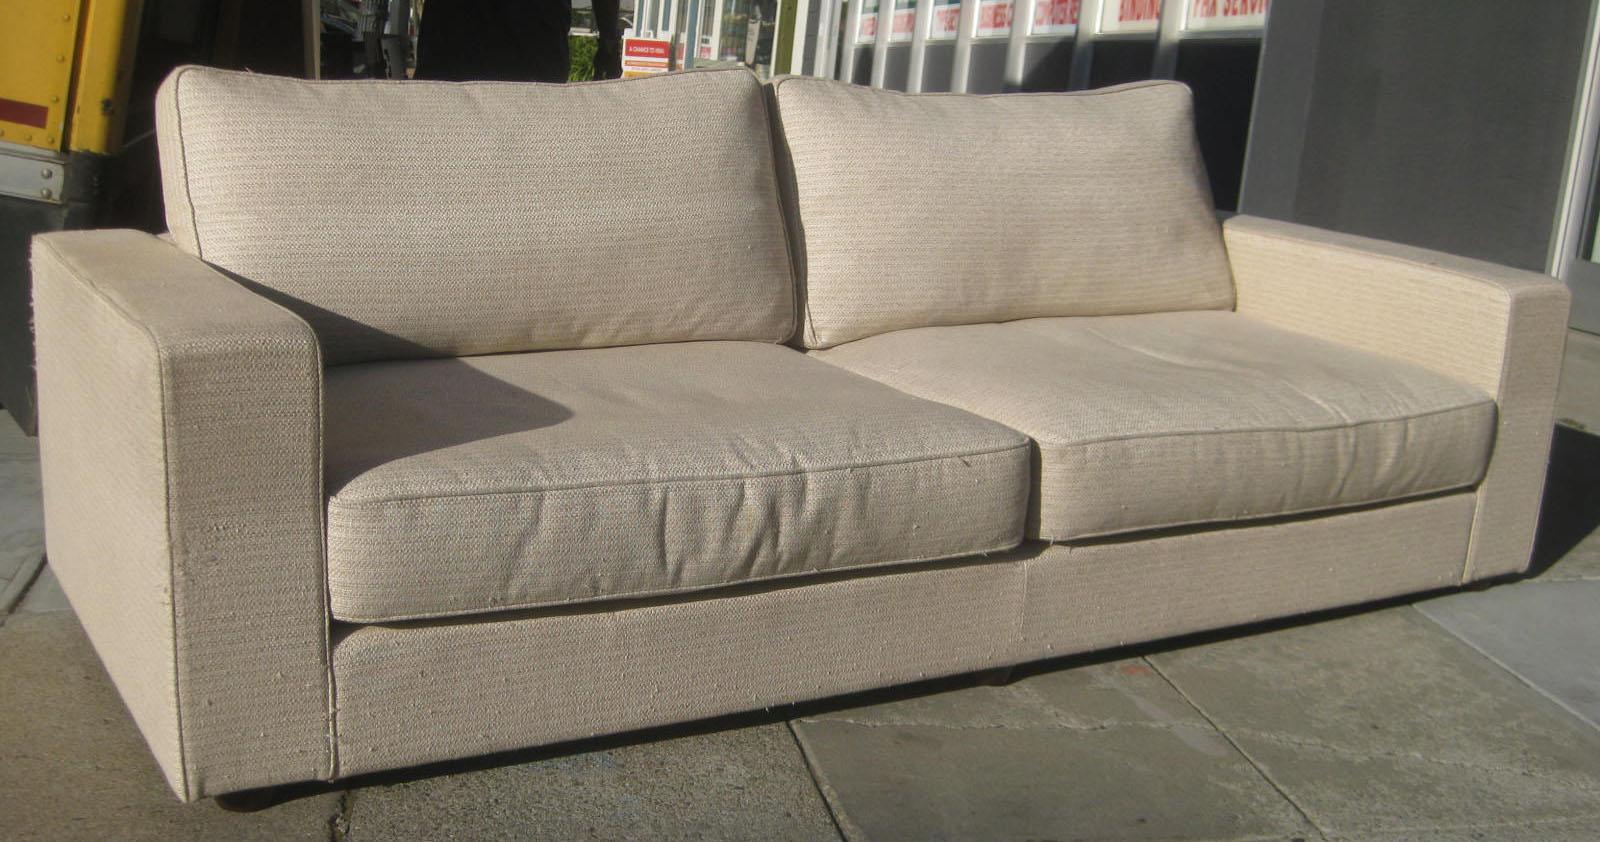 UHURU FURNITURE & COLLECTIBLES: SOLD - Boxy Off-White Sofa